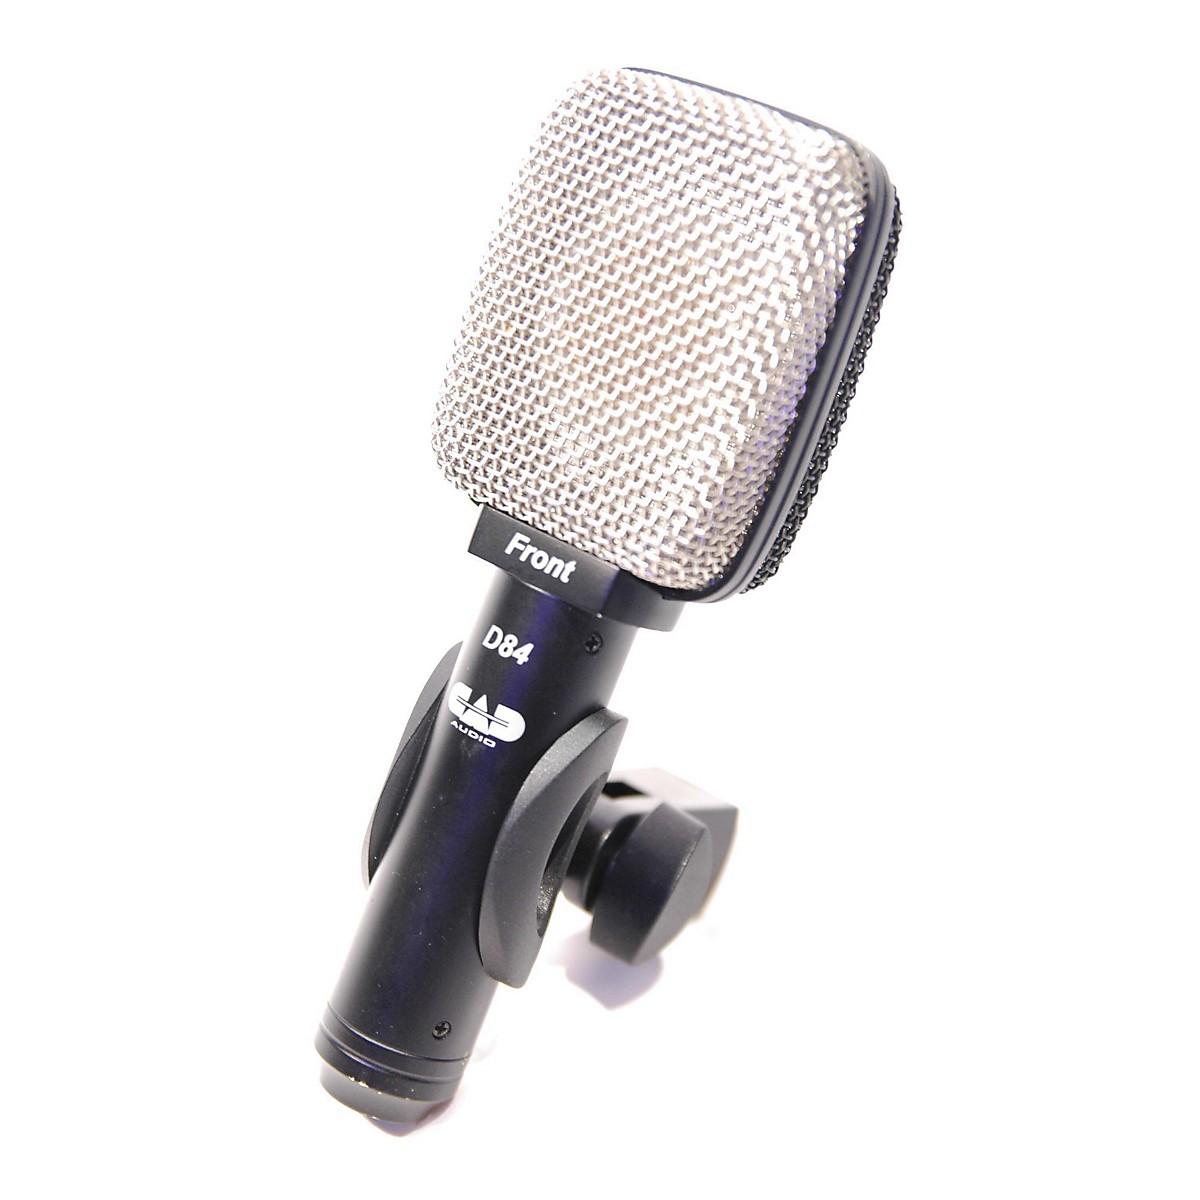 CadLive D84 Large Diaphragm Cardioid Condenser Microphone